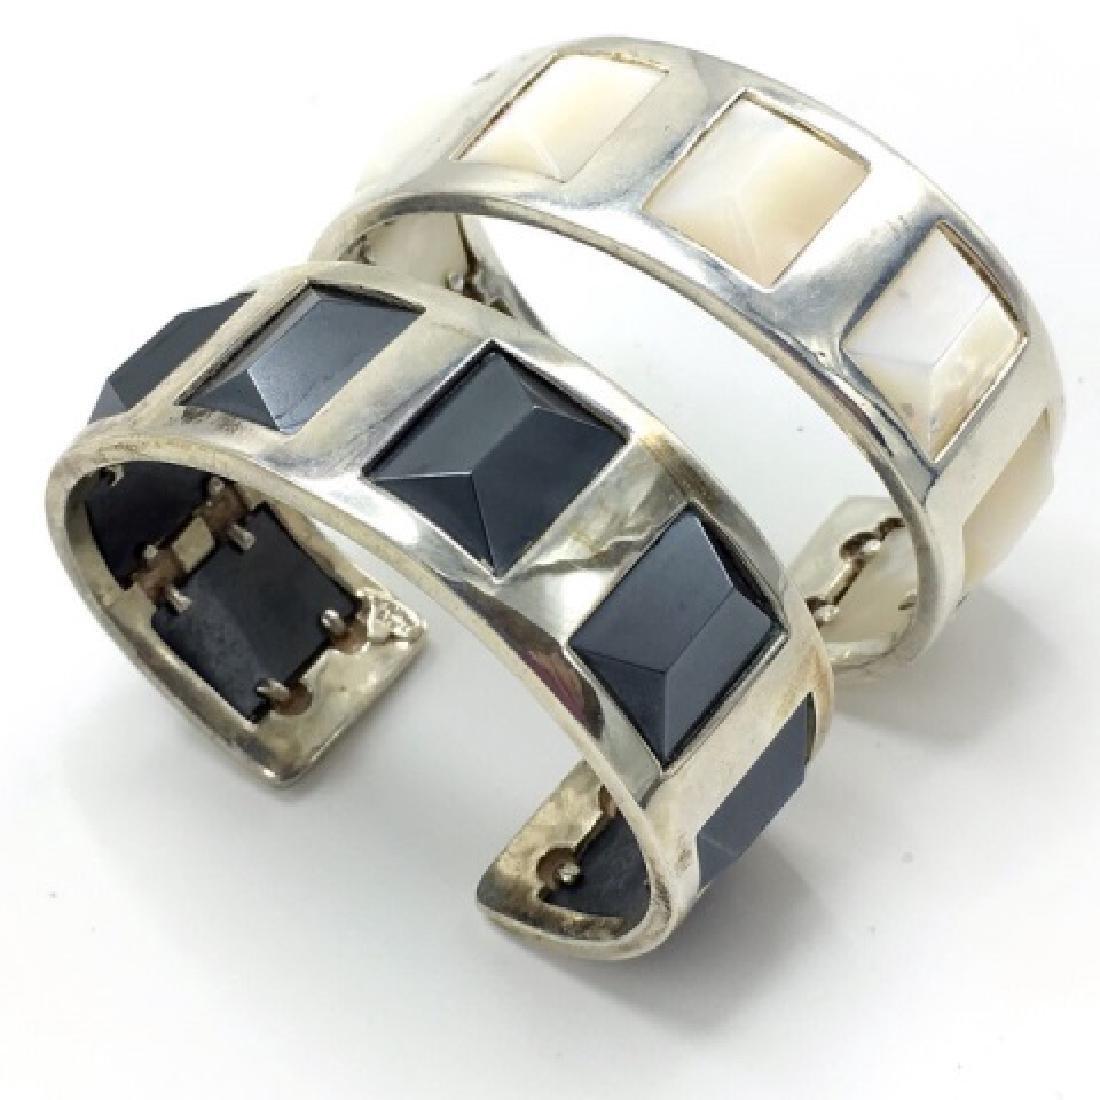 Hematite & Mother of Pearl Cuff Bracelets